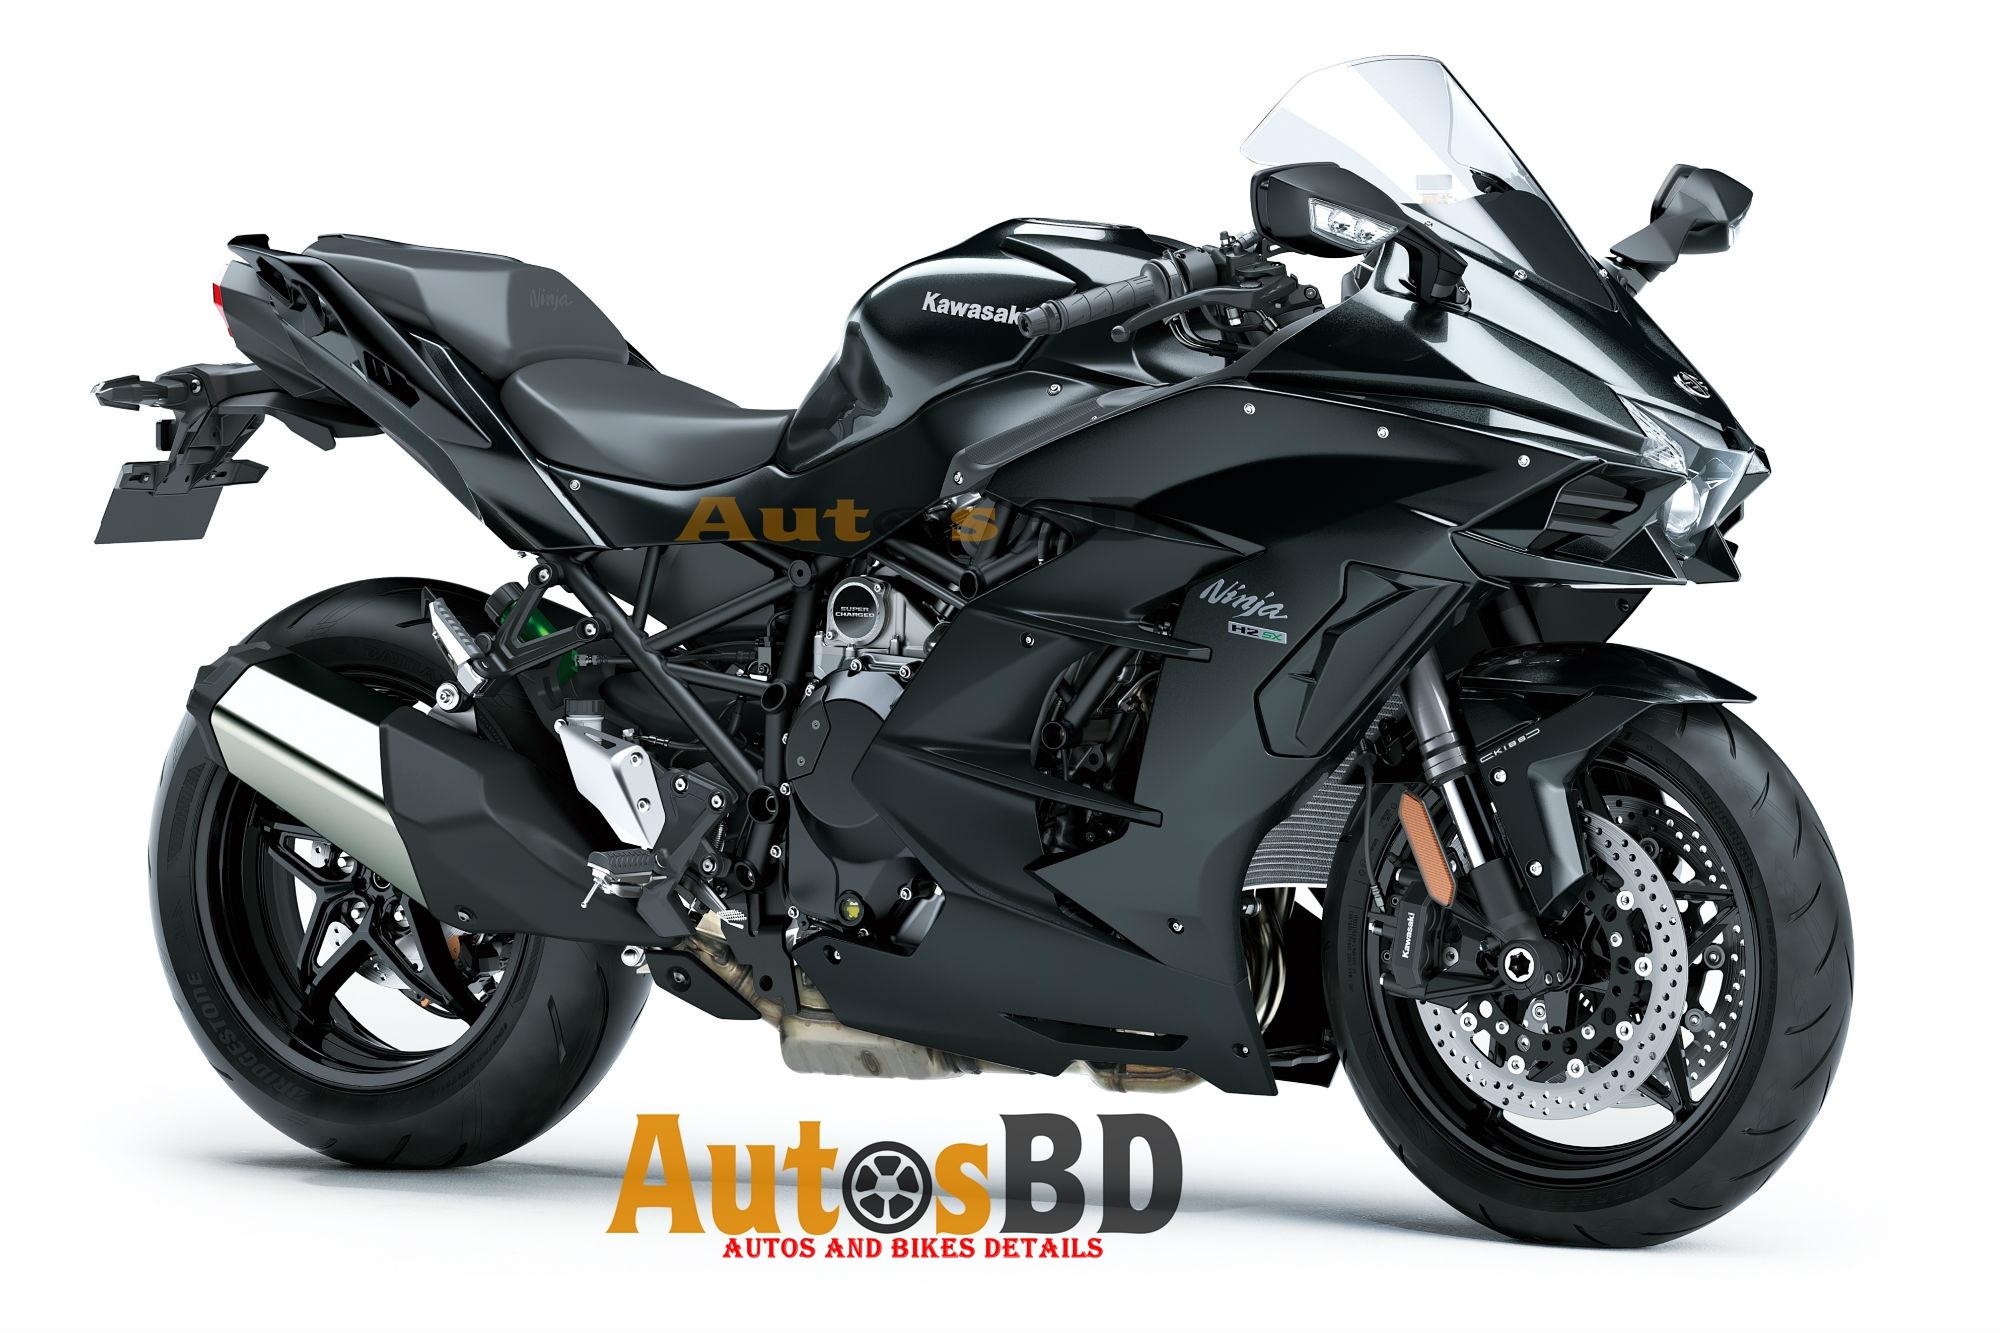 Kawasaki Ninja H2 SX Motorcycle Price in India